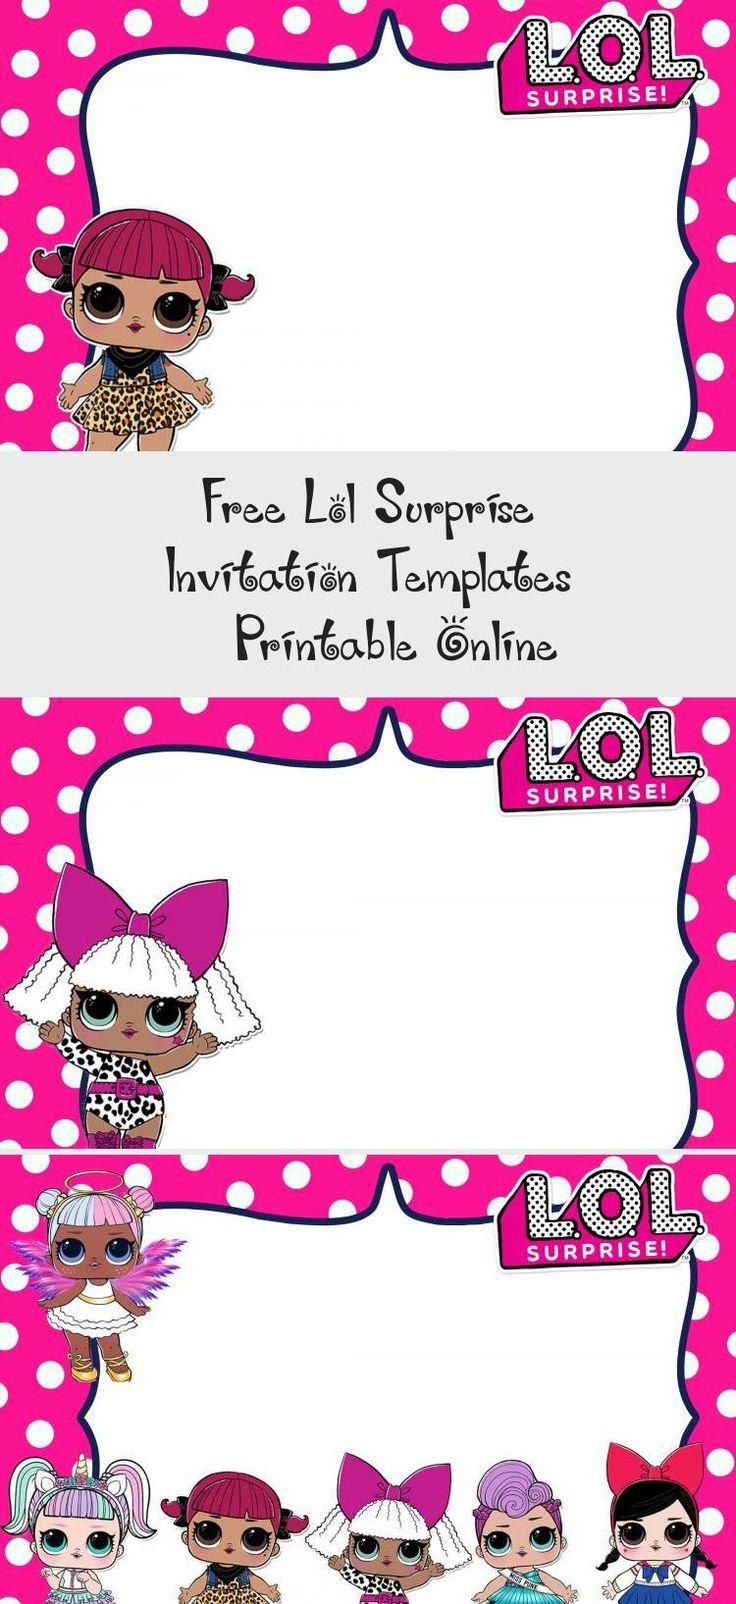 free lol surprise invitation templates  printable online